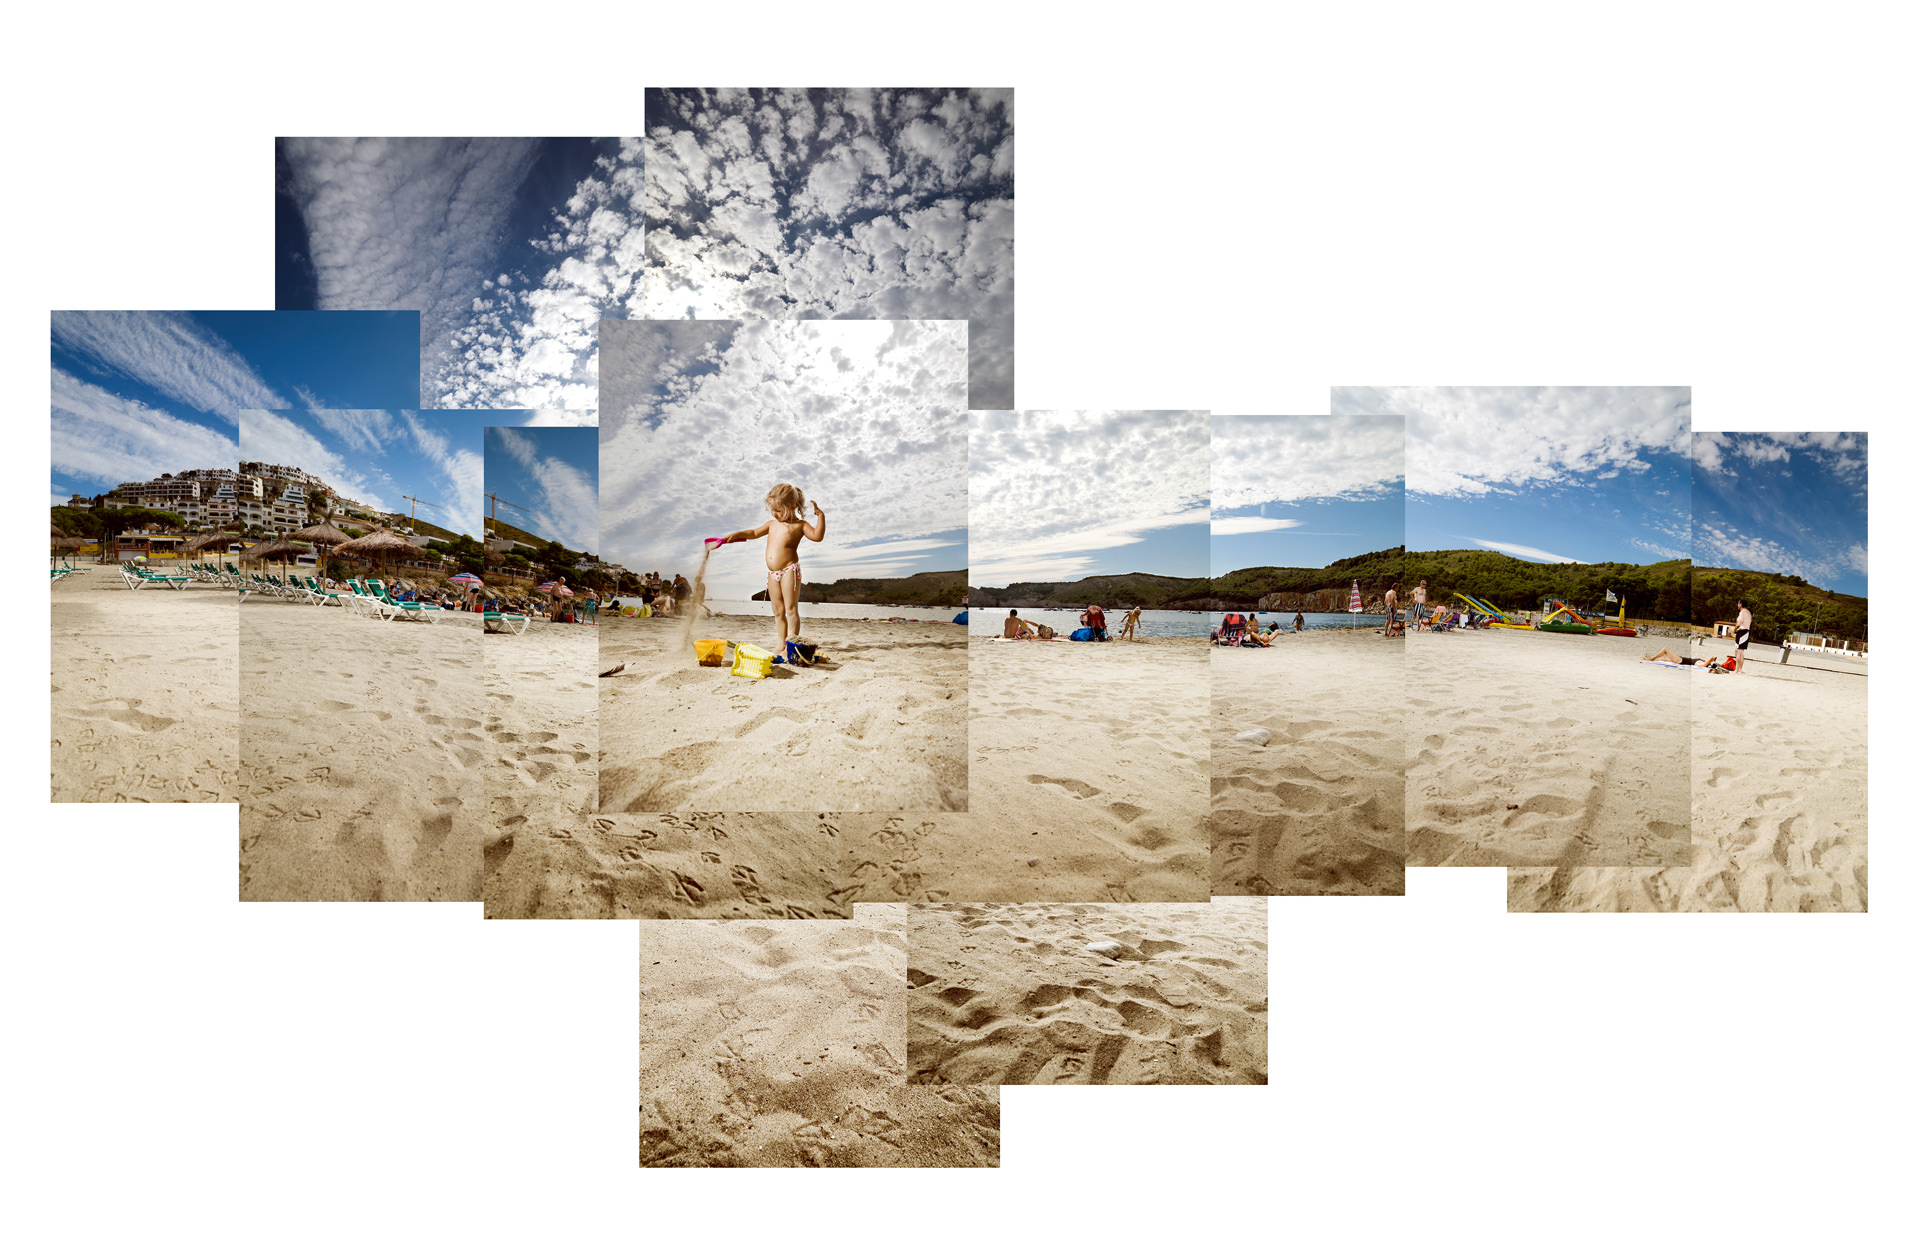 ©ankeluckmann642, ADAC, Reisemagazin, beach, spain, costa brava, people, landscape